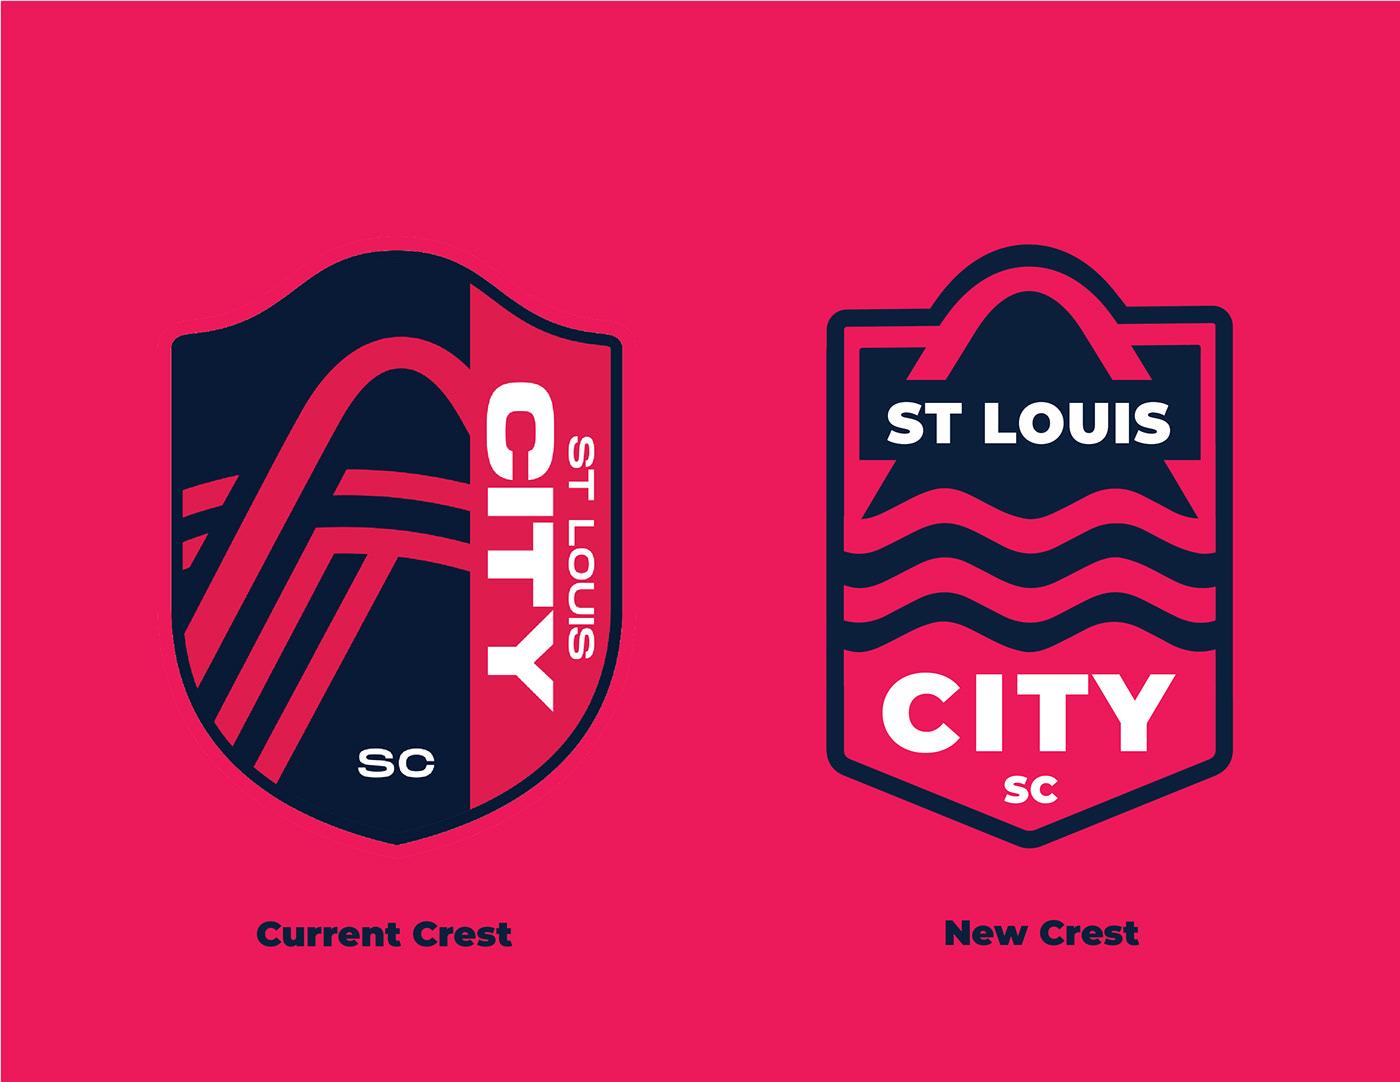 St Louis City SC Rebranding on Behance